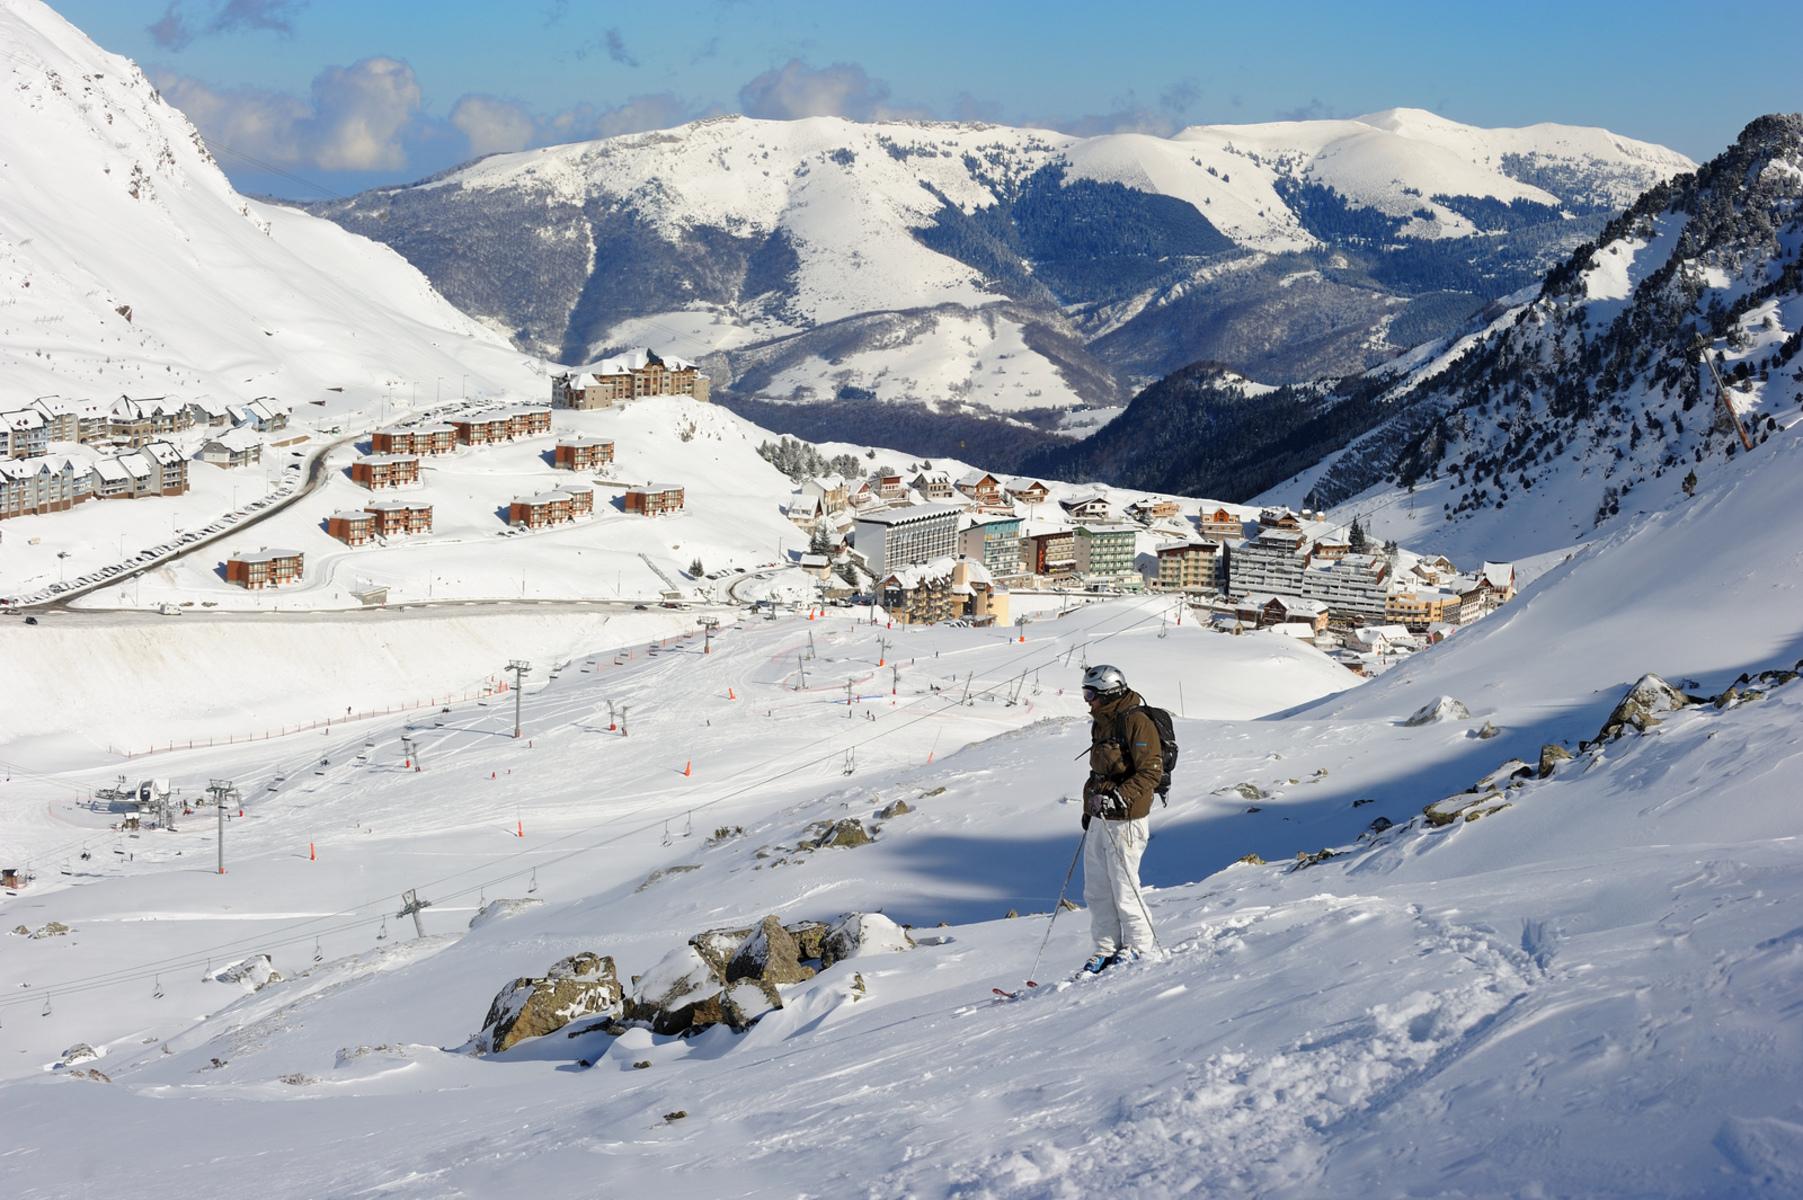 Fili res et secteurs bagn res de bigorre - Office tourisme bagneres de bigorre ...